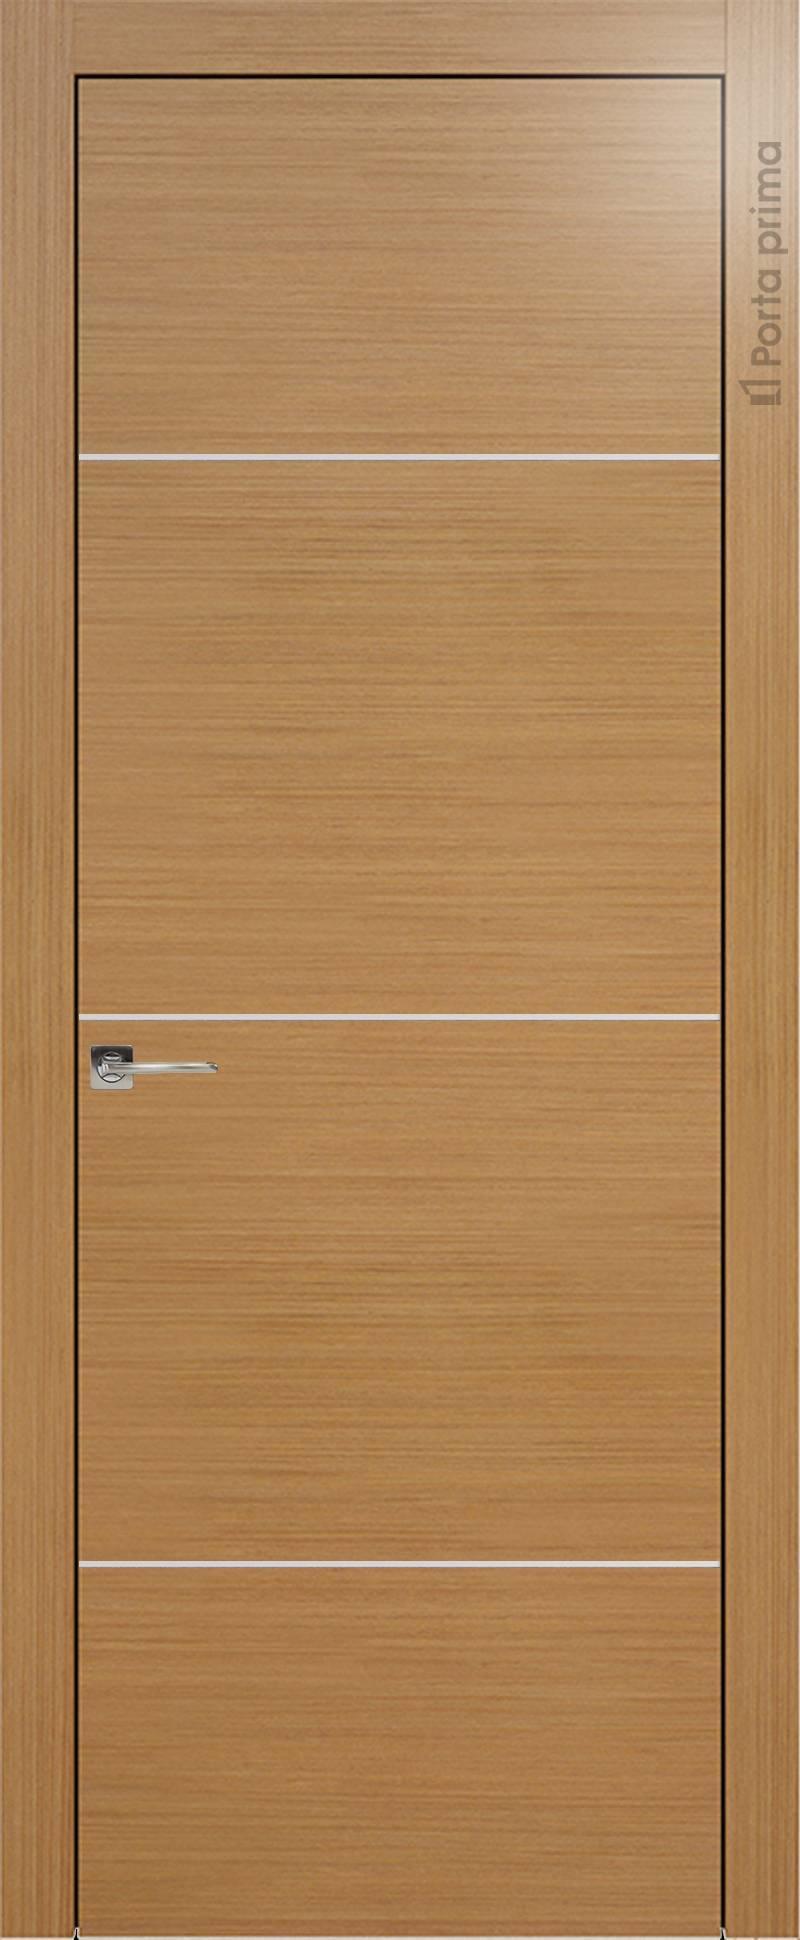 Tivoli Г-3 цвет - Миланский орех Без стекла (ДГ)